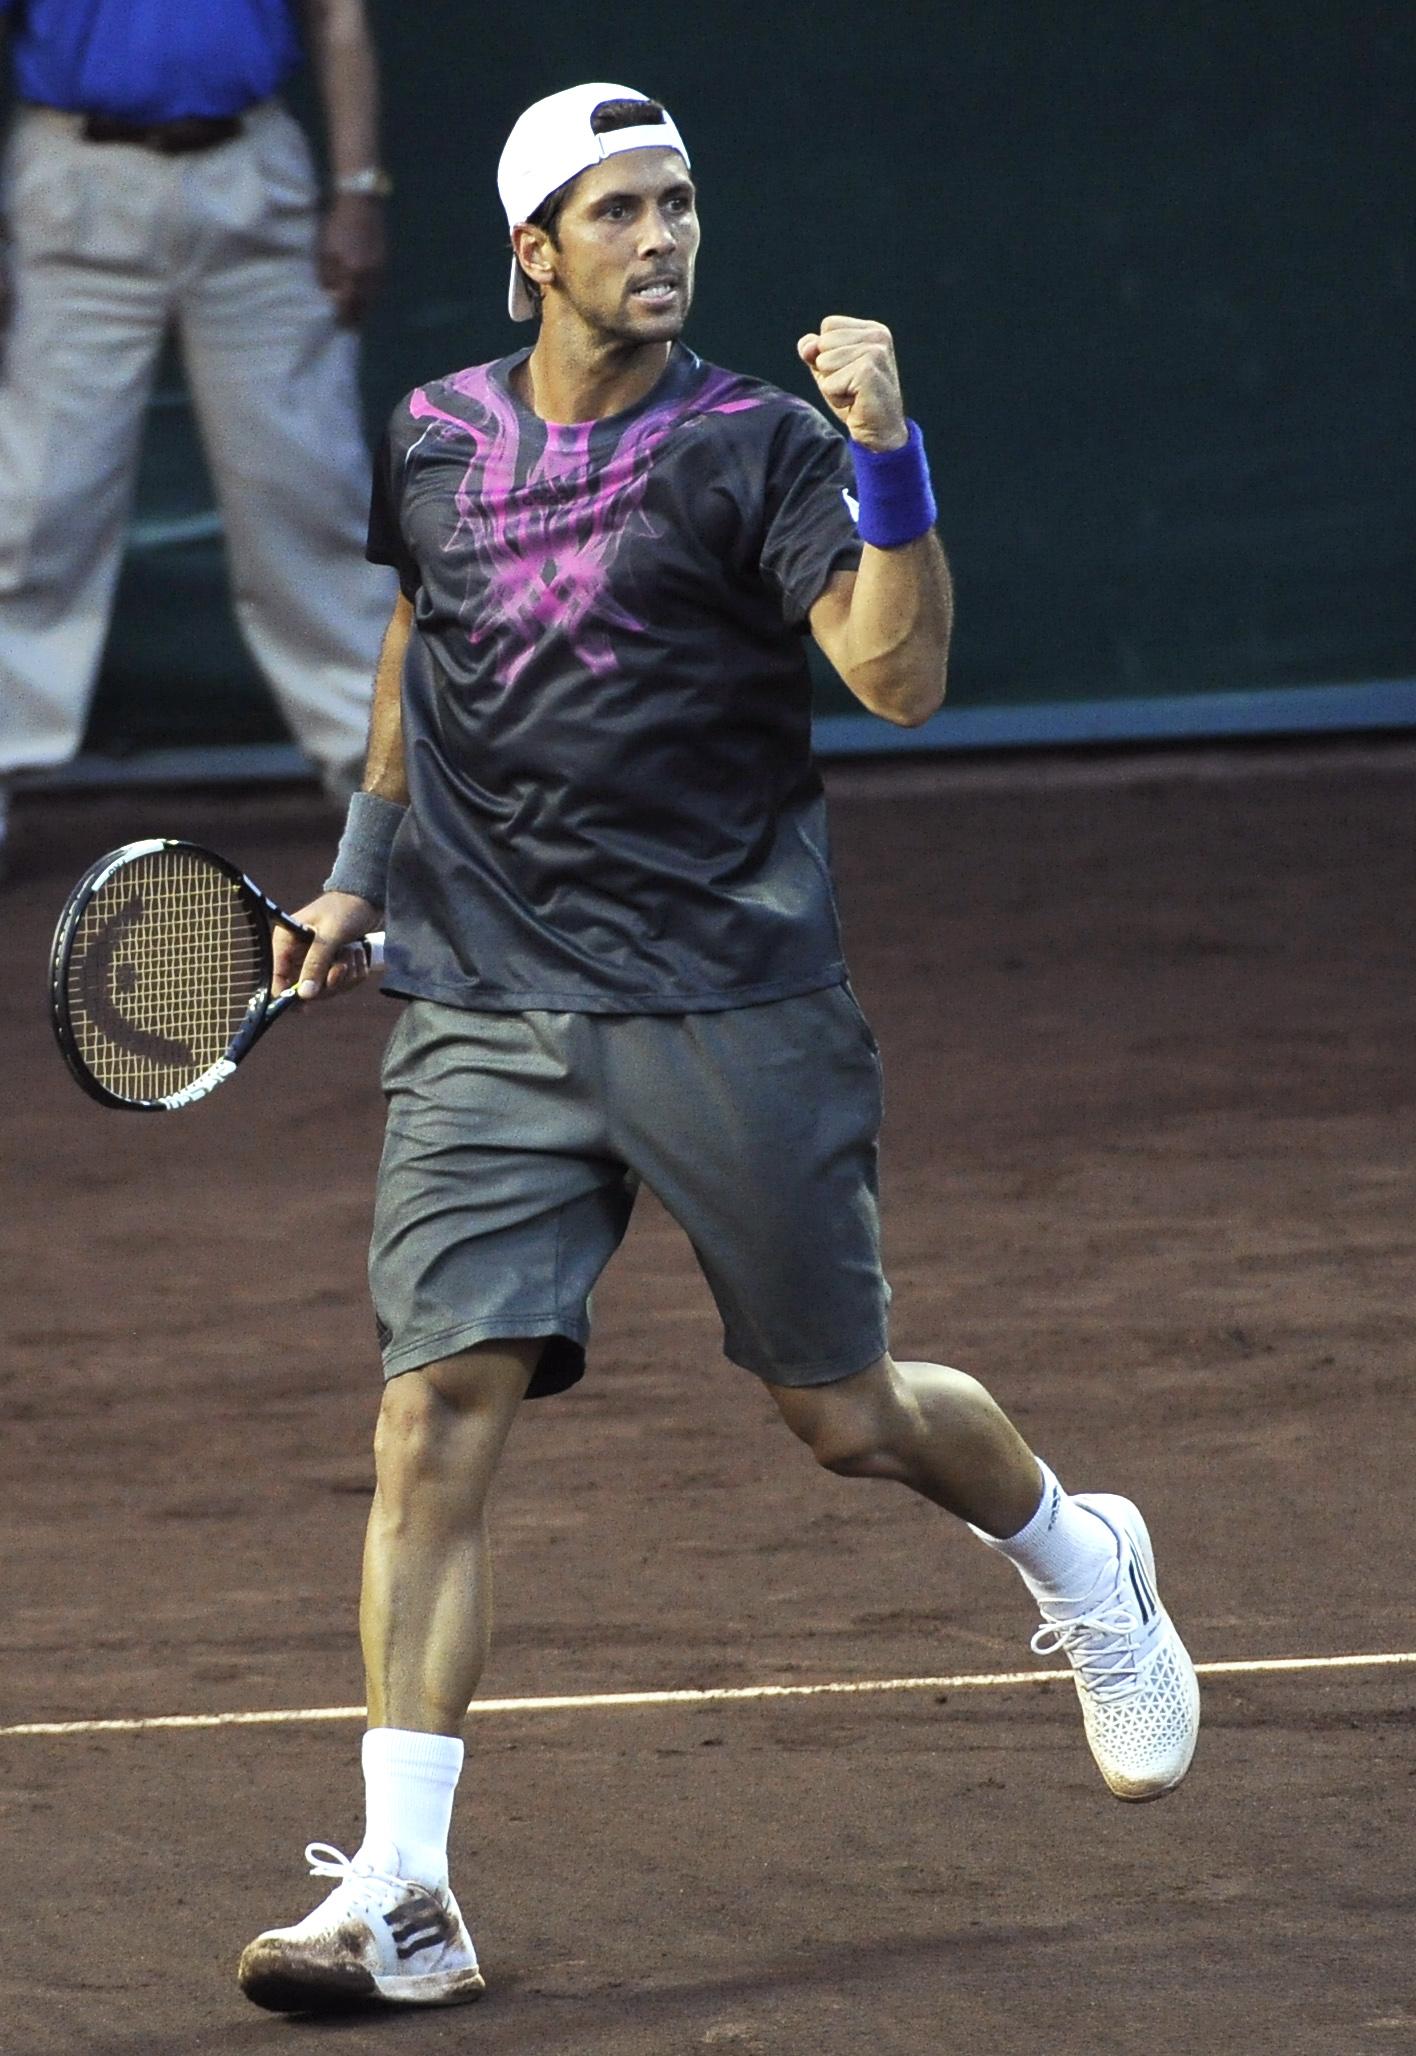 Defending champion Verdasco reaches semifinals